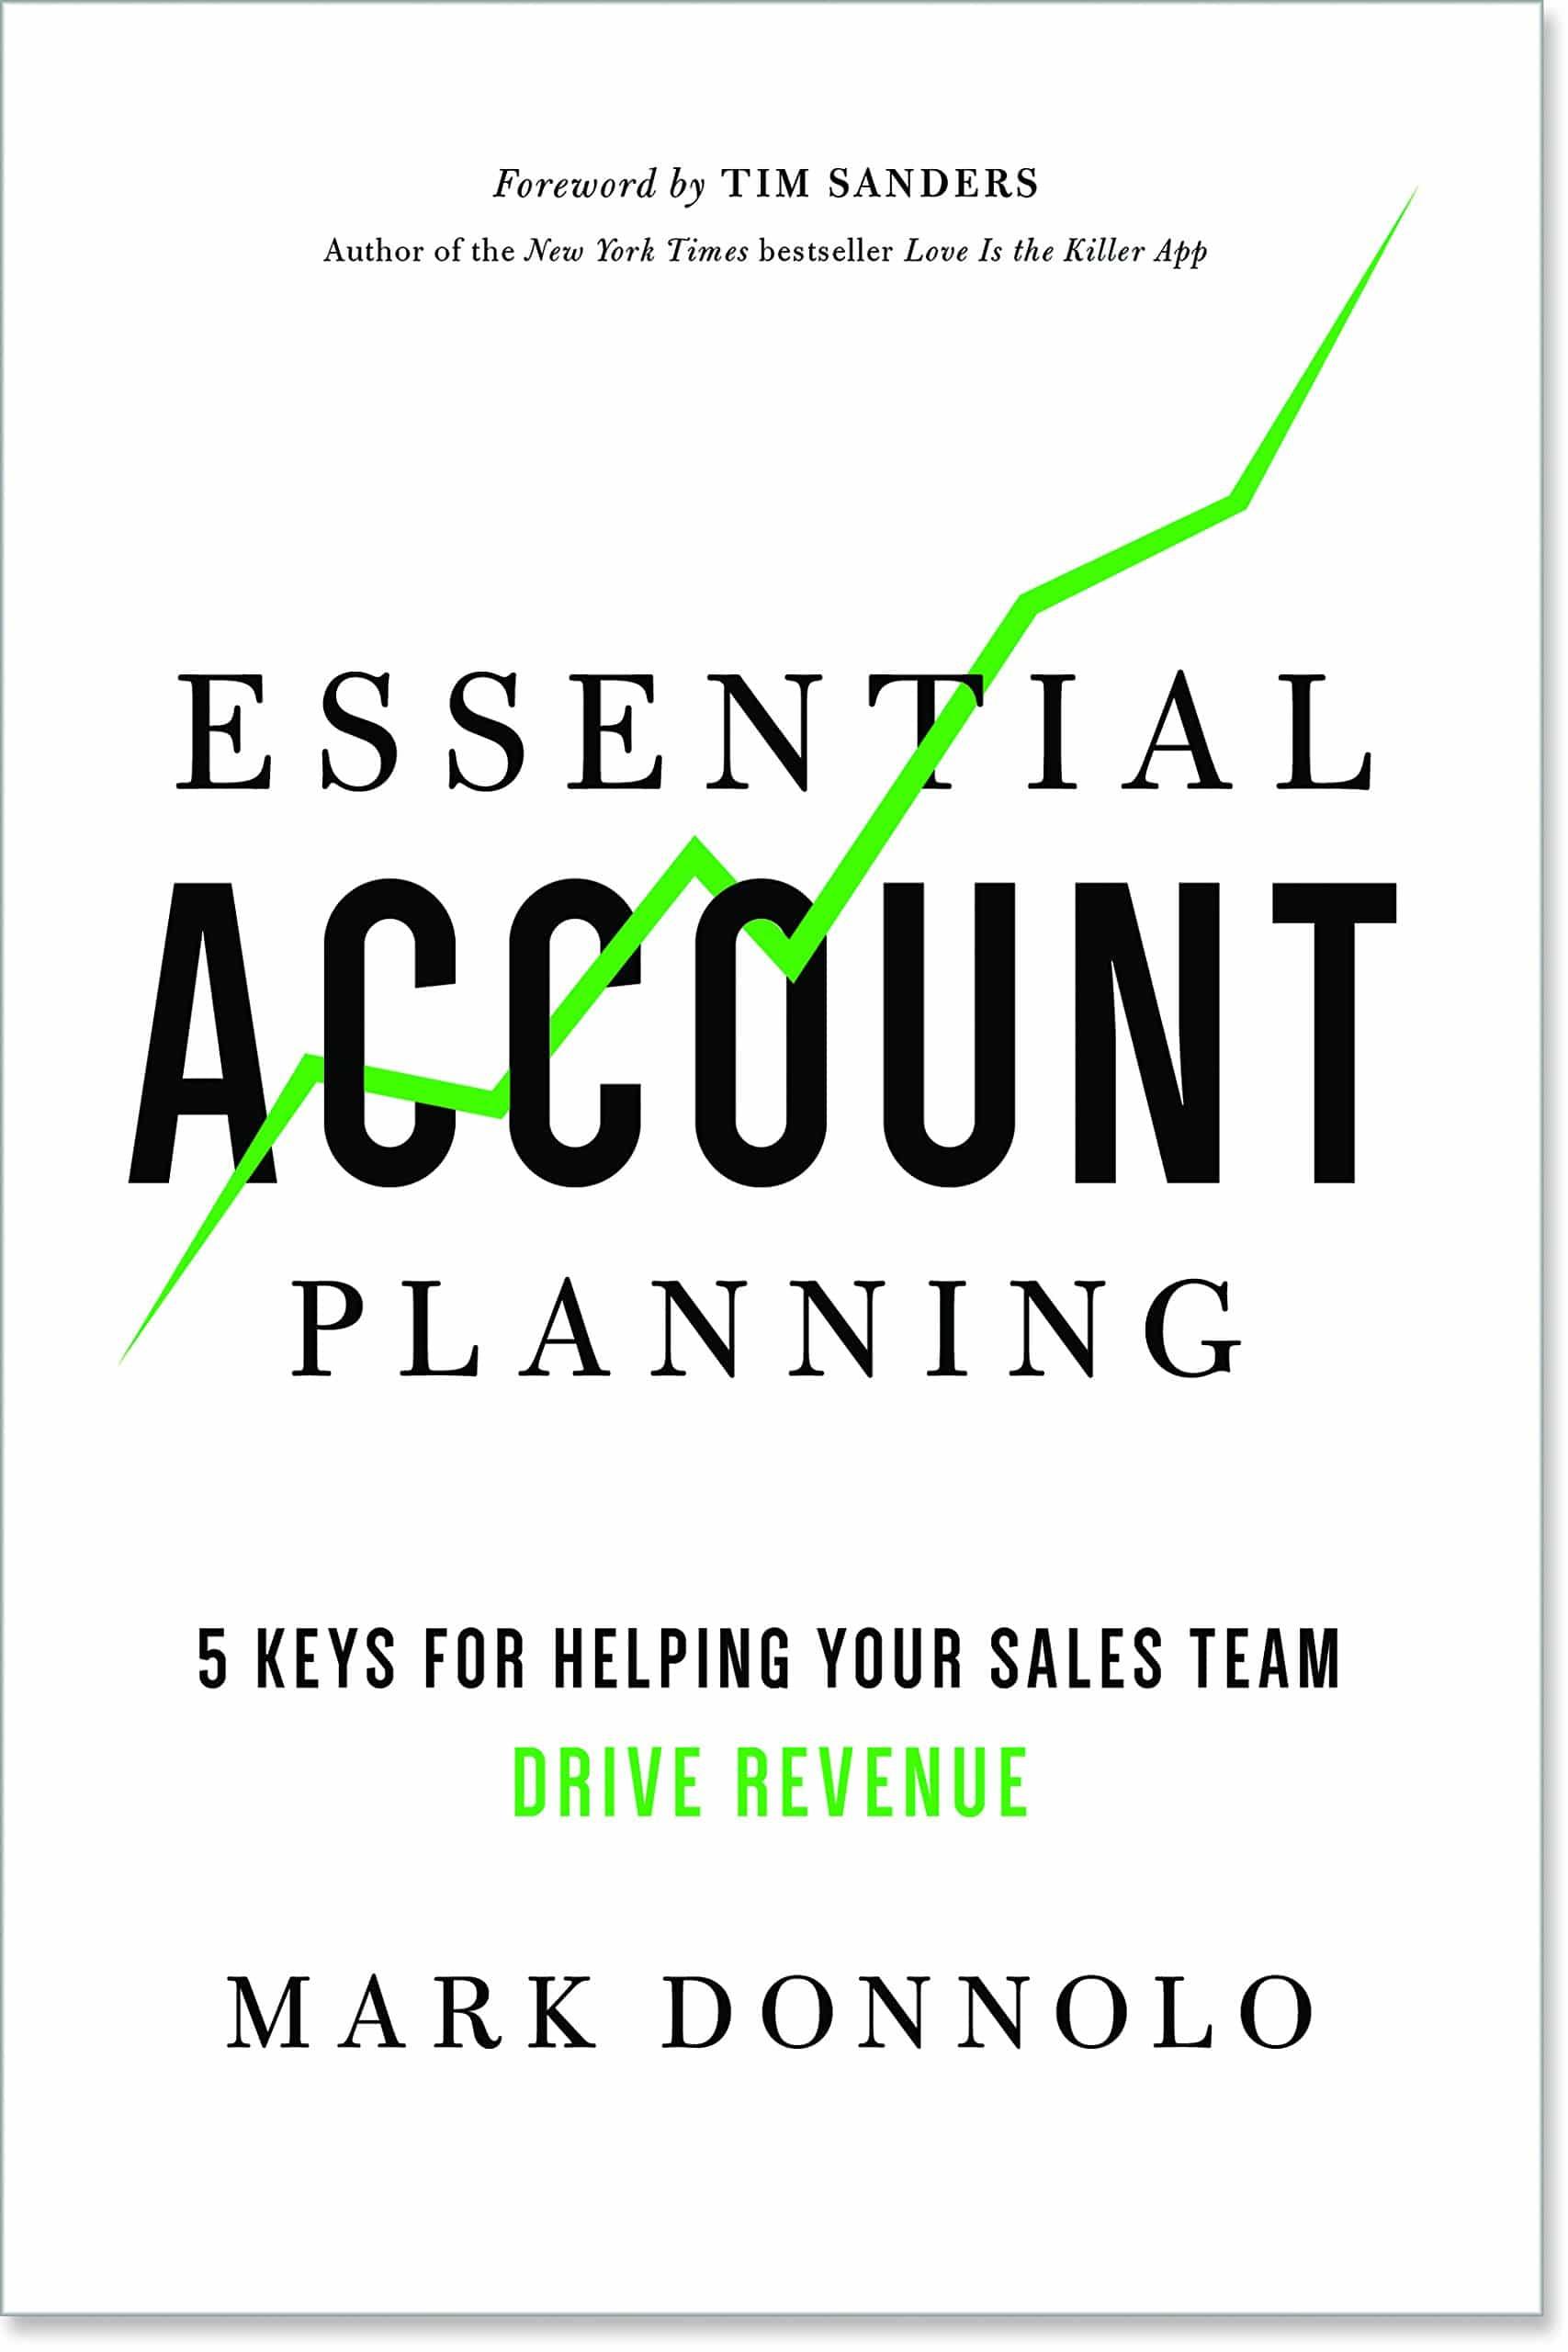 Essential Account Planning